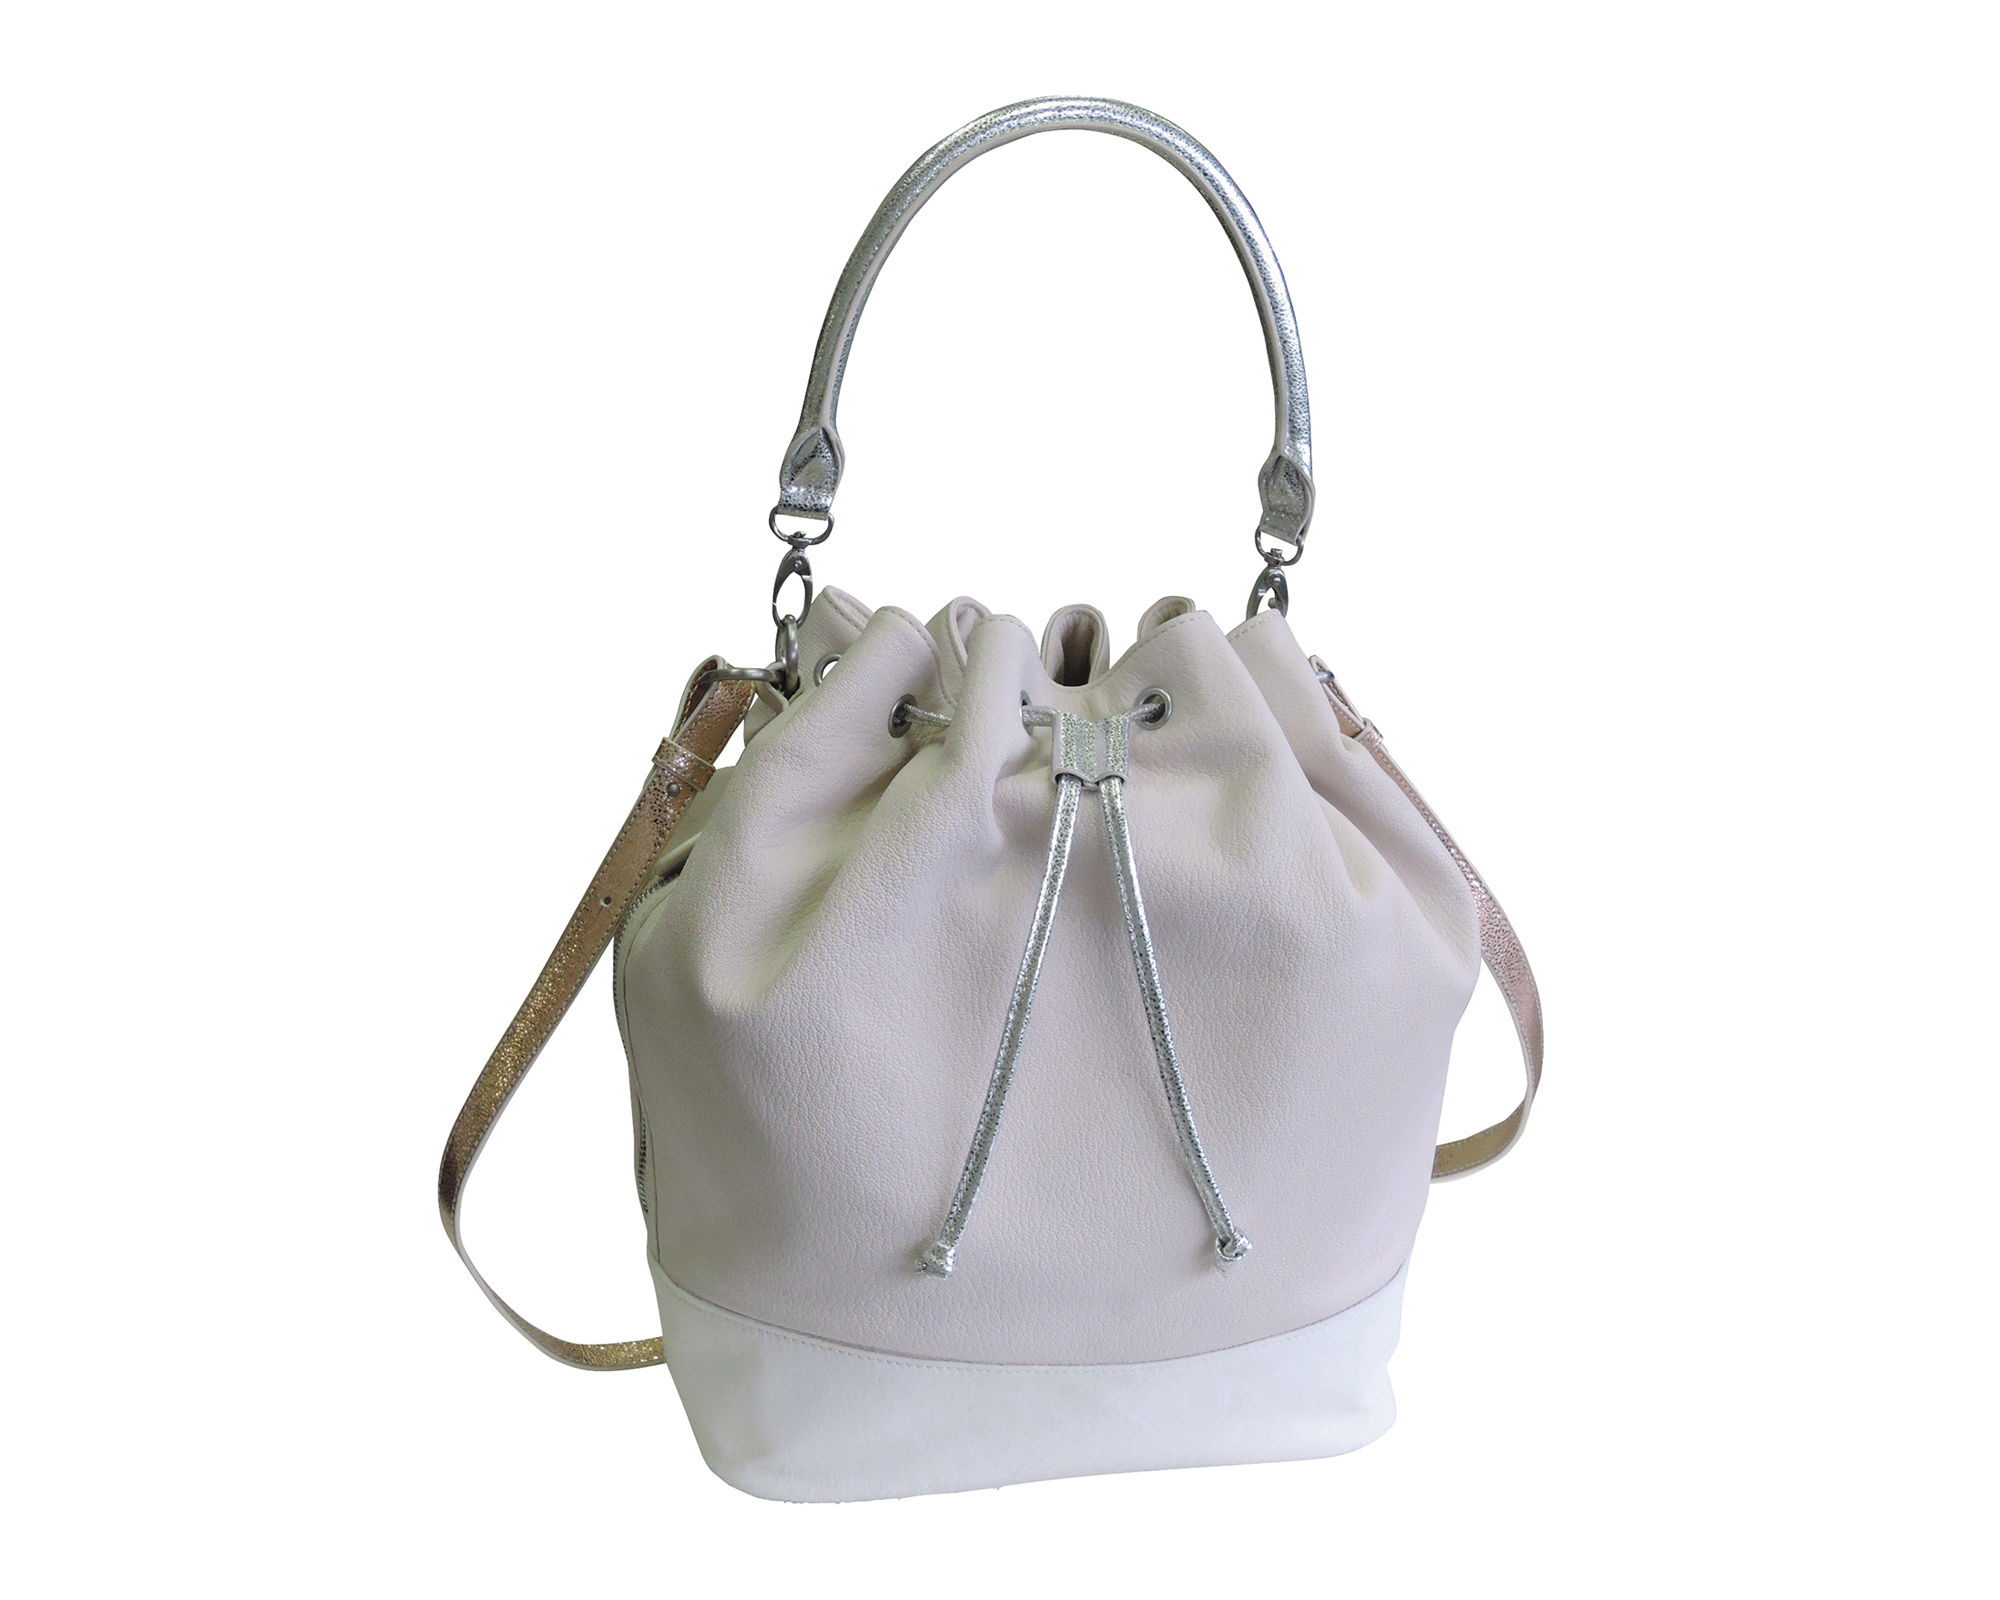 Adrienne Landau Calypso LES Bucket Bag